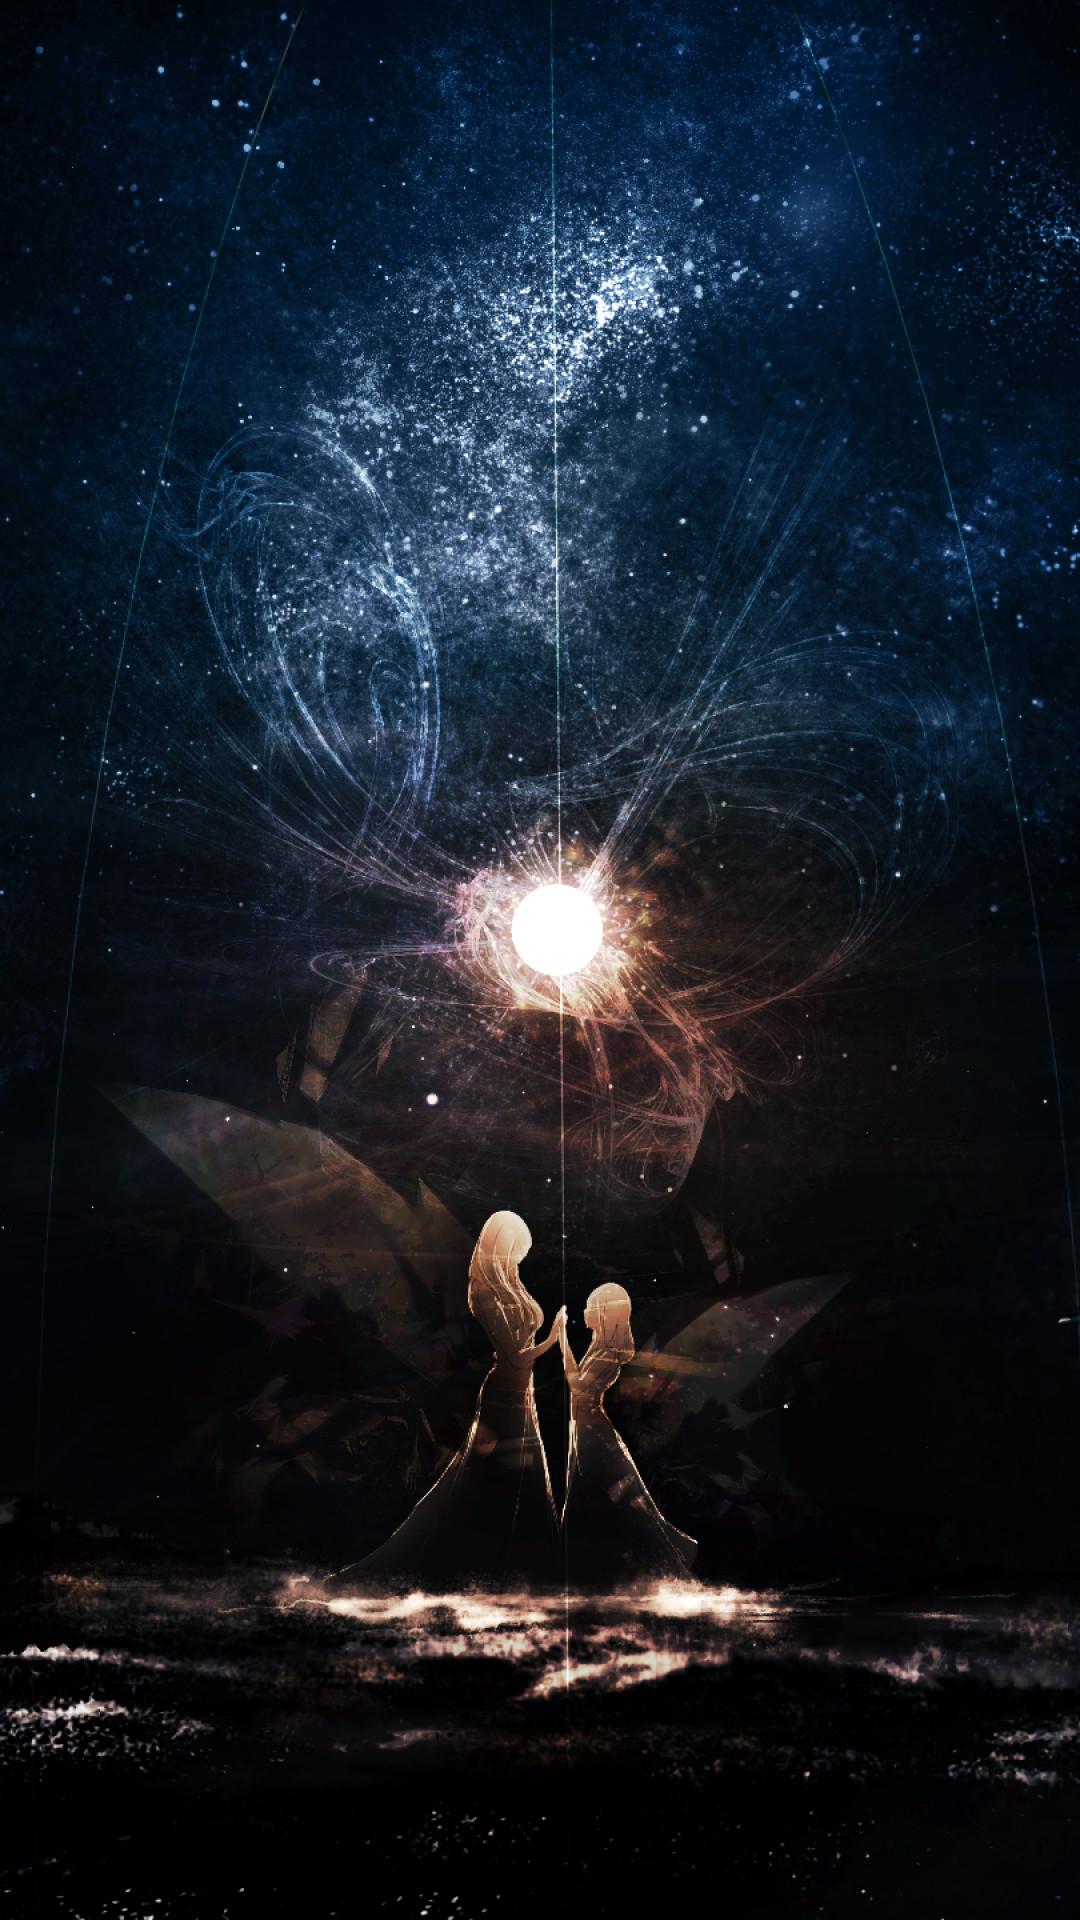 Anime Girls, Magic, Stars, Reflection, Dark